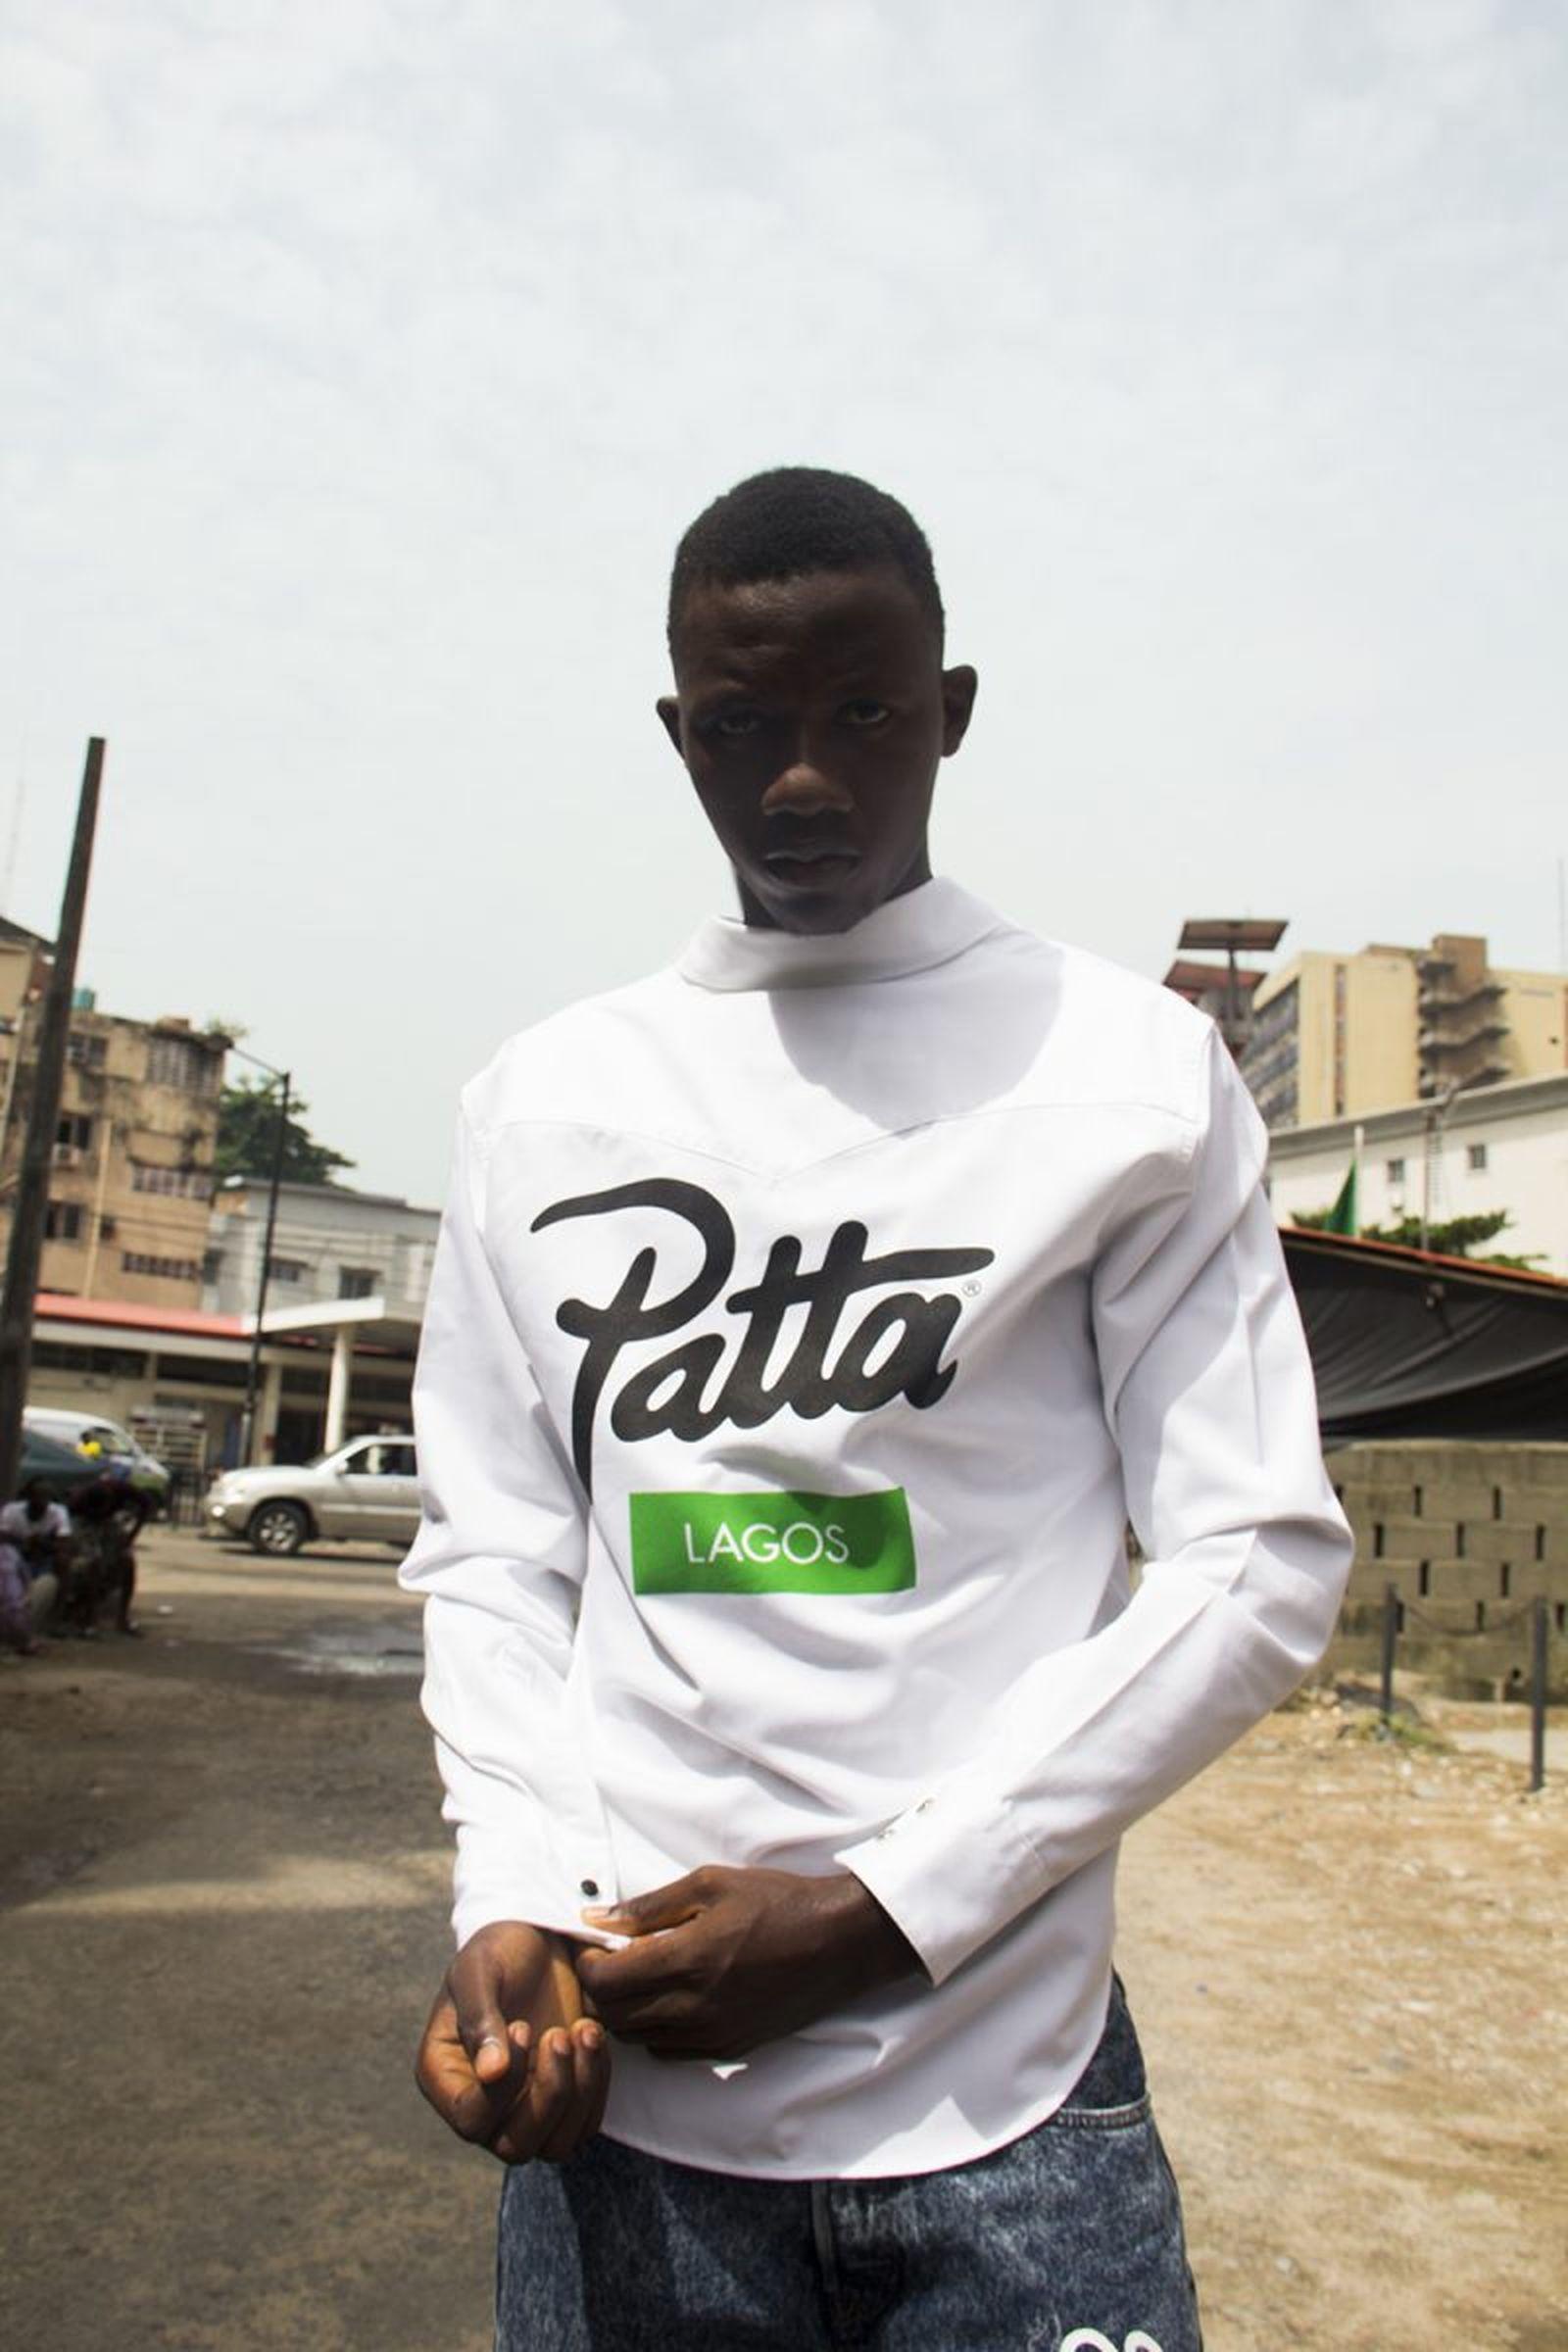 Patta Lagos1 KL 800x1200 BornxRaised Pyer Moss clot